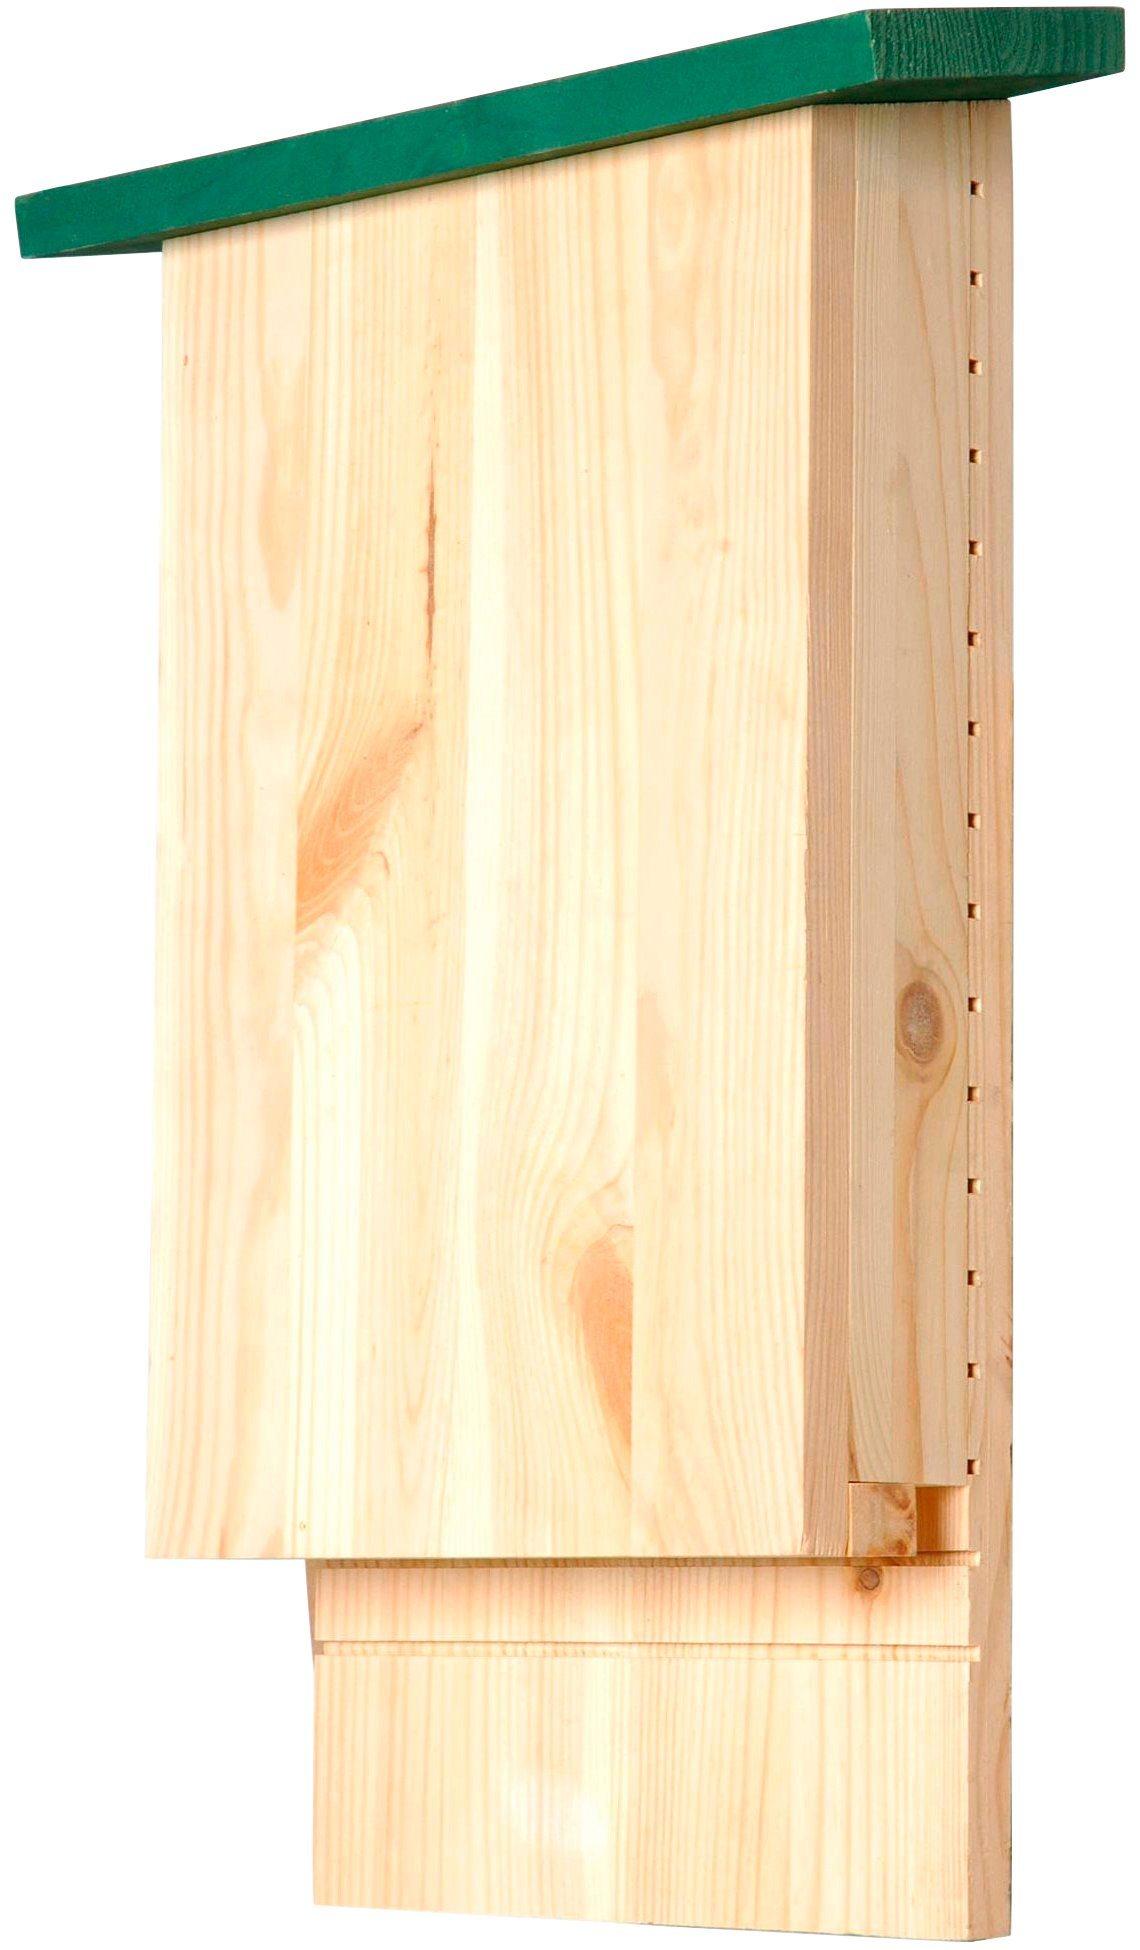 DOBAR Nistkasten »Chioptera«, BxTxH: 14x22x24 cm